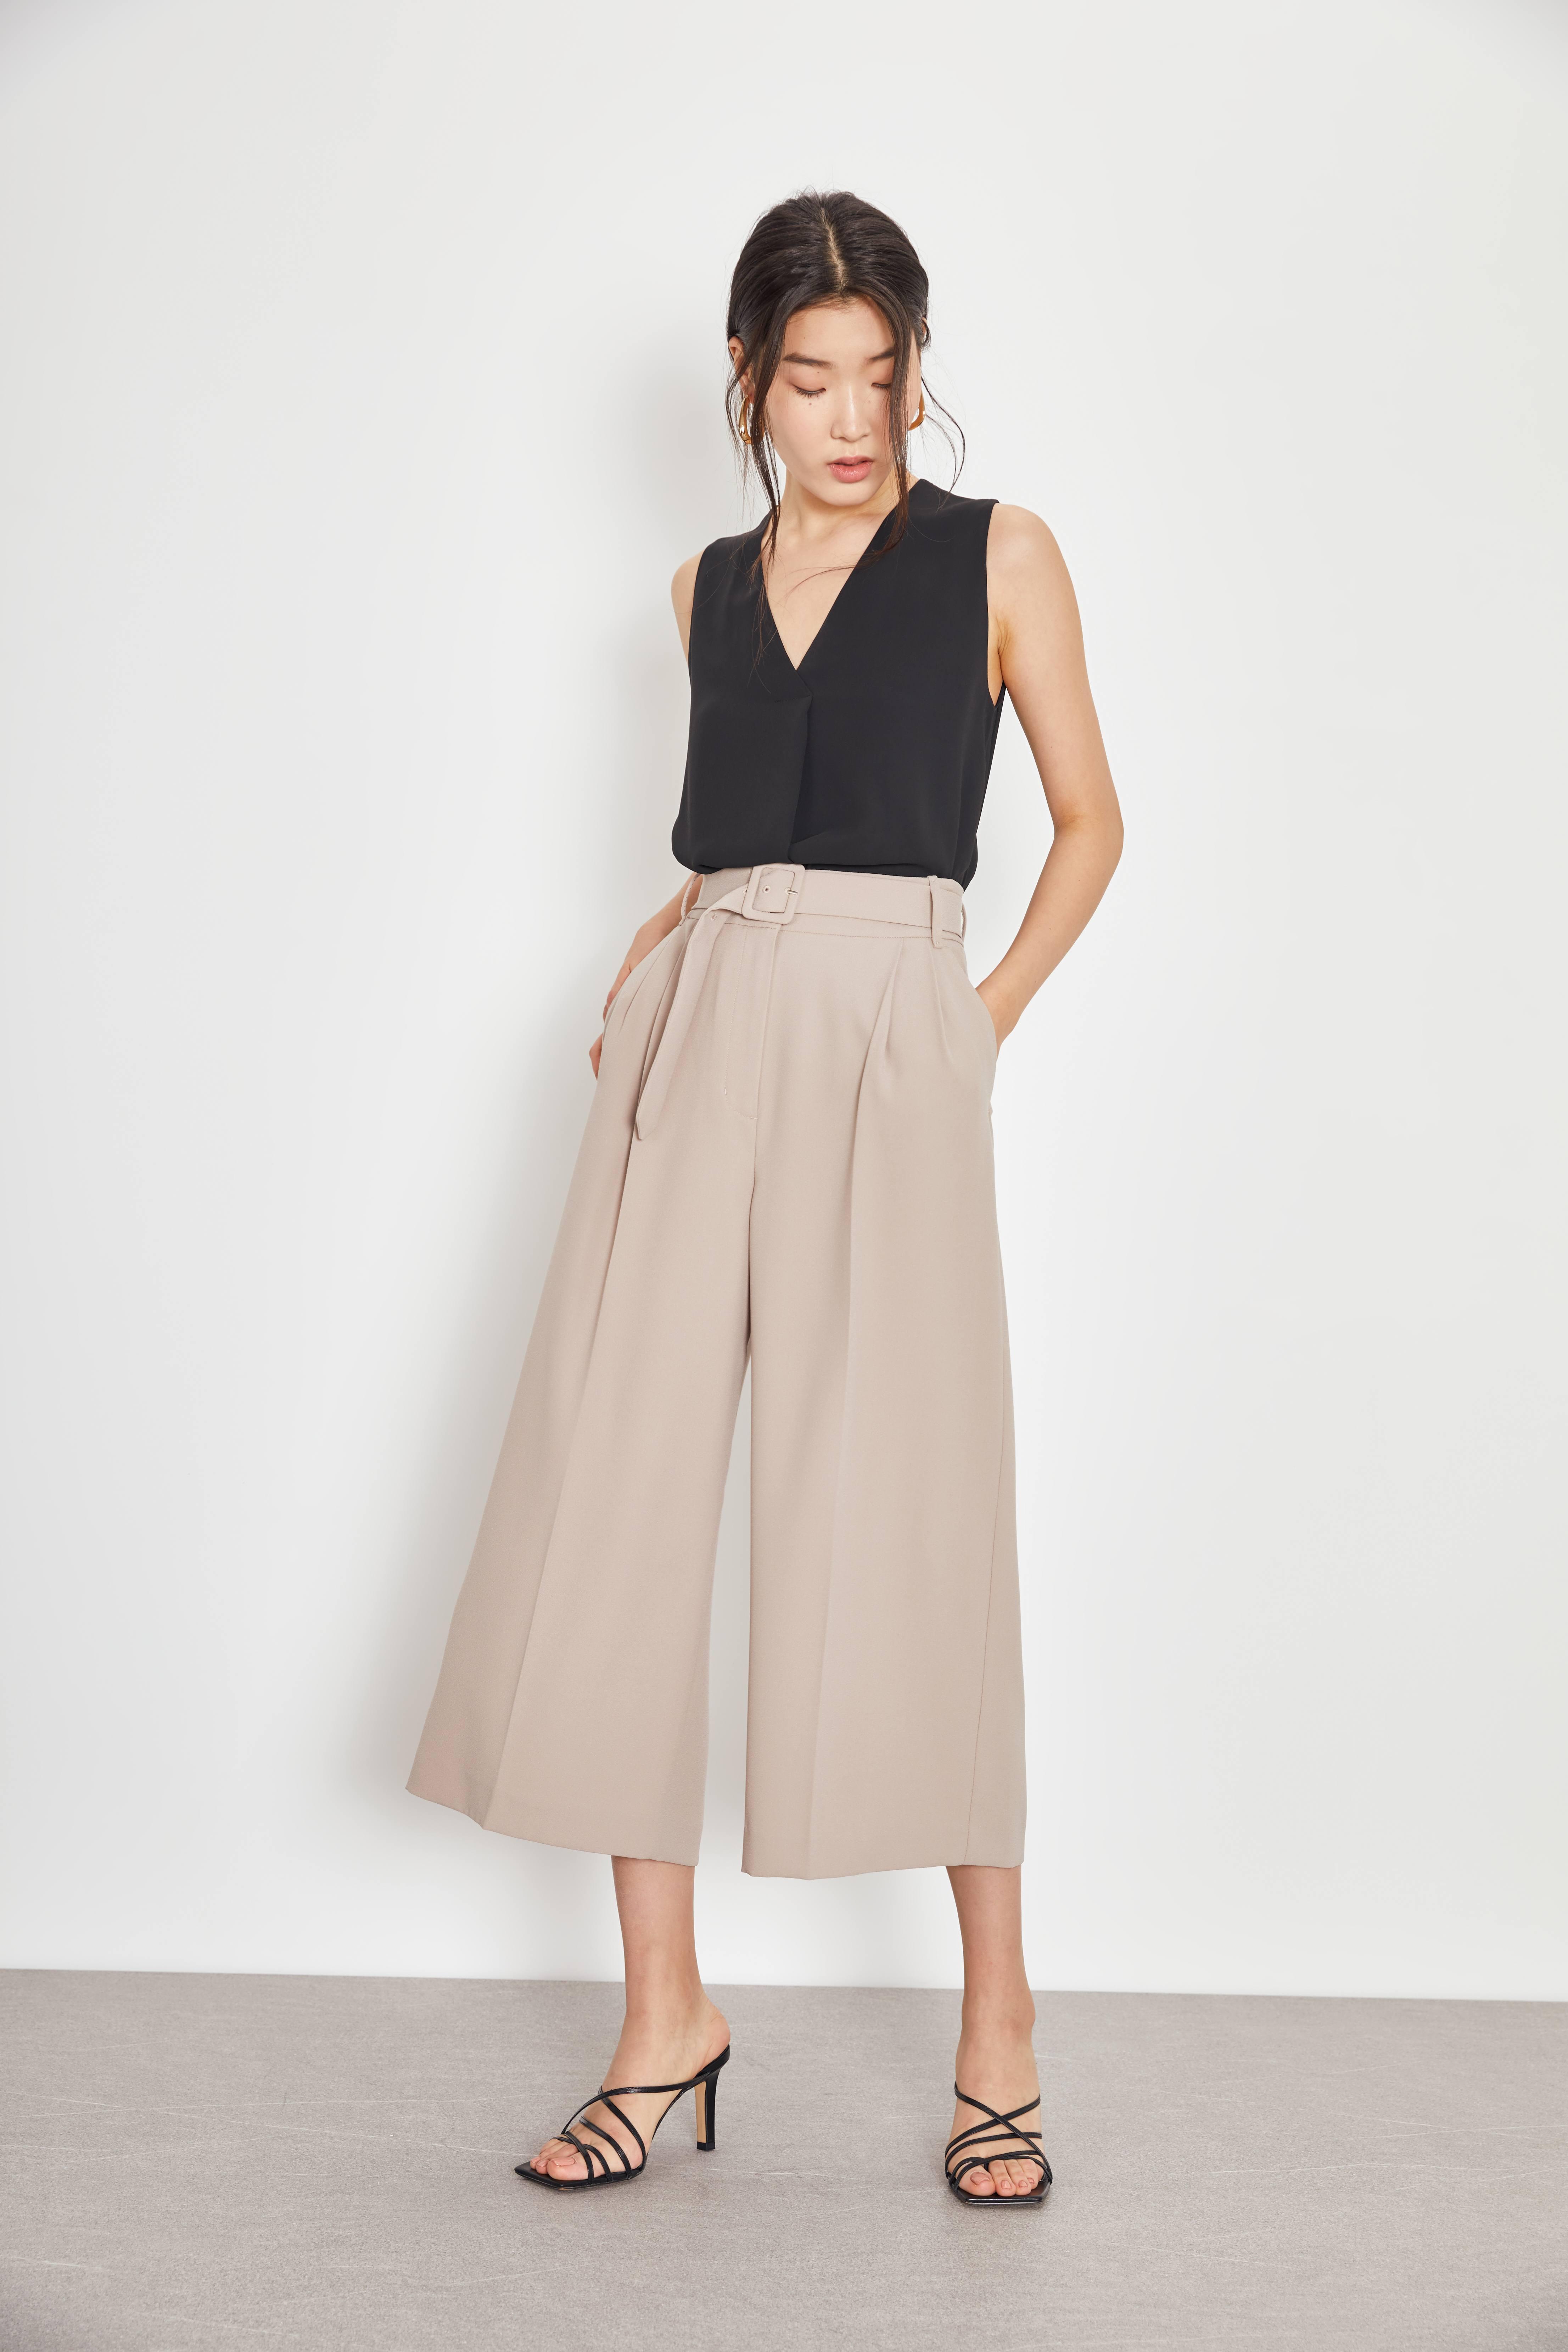 Блузка LIME Блузка со складкой блузка francesca lucini блузка